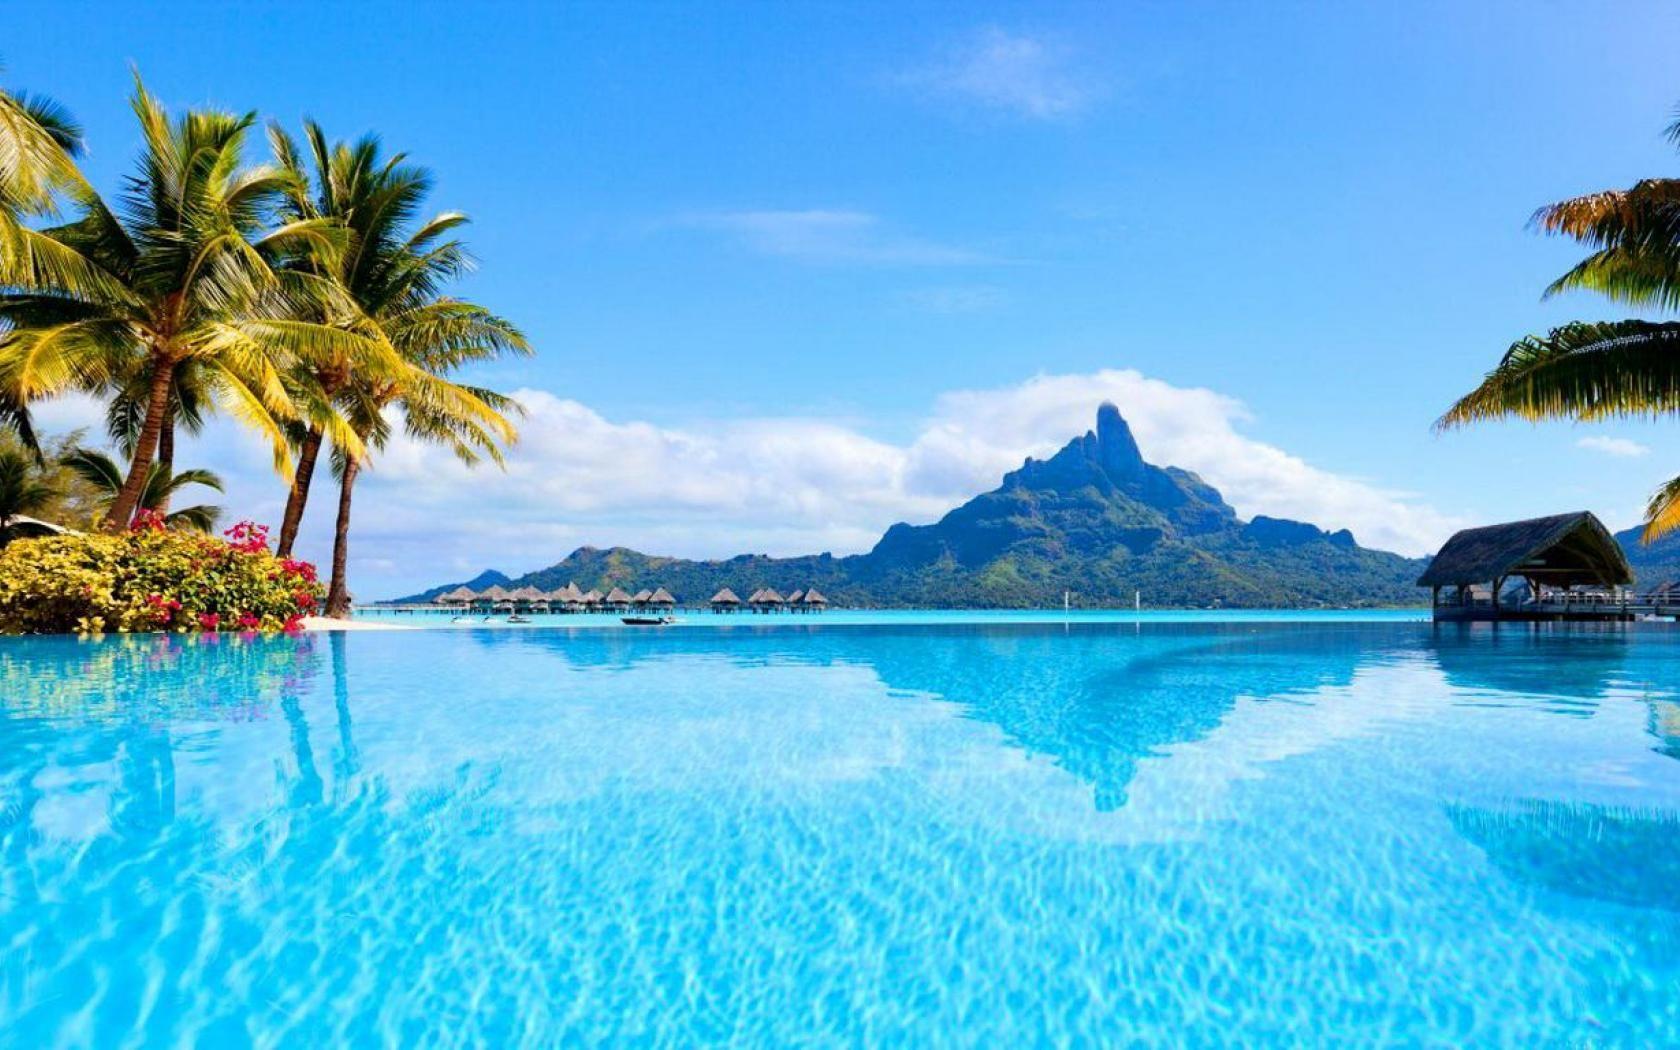 Bora Bora 107891 High Quality And Resolution Wallpapers Bora Bora Island Romantic Vacations Vacation